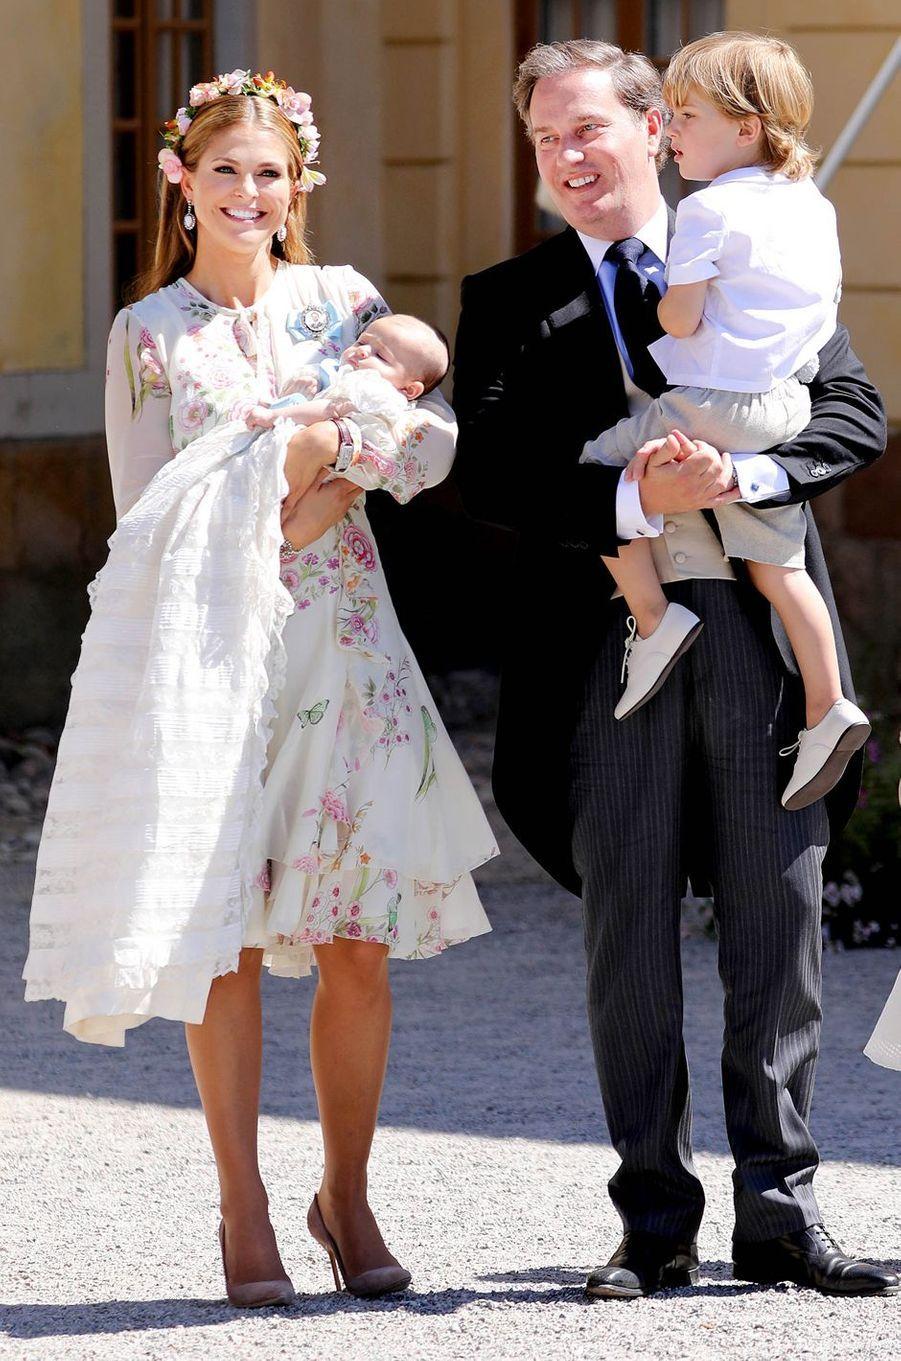 La princesse Madeleine de Suède dans une robe Giambattista Valli, le 8 juin 2018